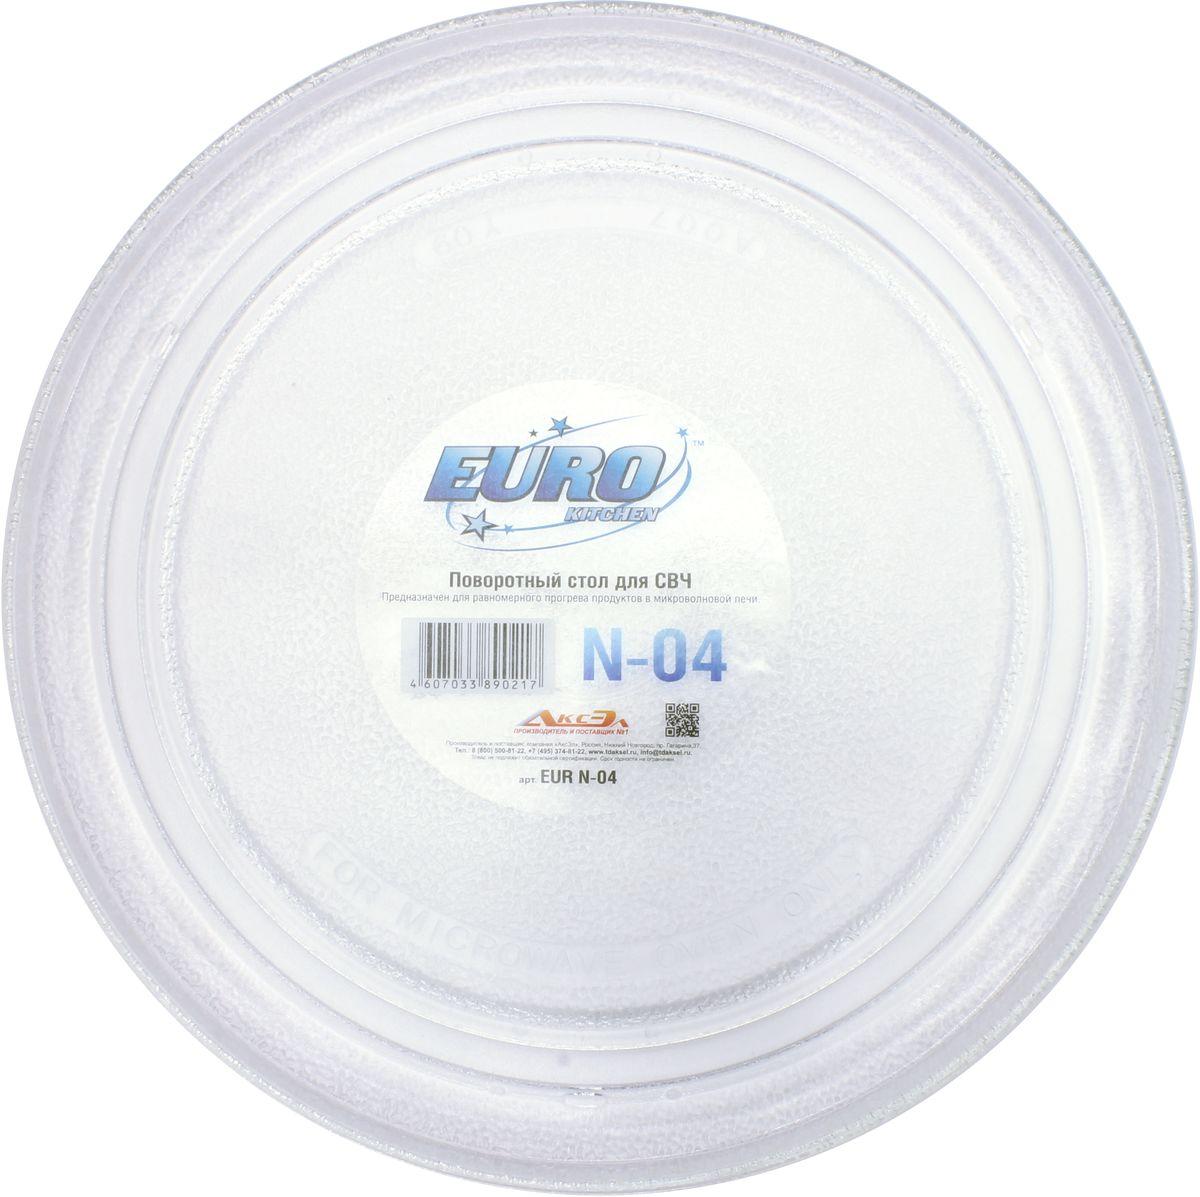 Euro Kitchen N-04 тарелка для СВЧN-04Универсальная тарелка N-04 для микроволновой печи с крестовиной. Диаметр тарелки 272 мм. Изготовлена из специального жаропрочного стекла. Предназначена для равномерного разогрева продуктов в микроволновой печиПодходит для брендов:Aeg, Airhot, Amica, Ardo, Ariston, Asko, Atlanta, Aurora, Ava, Barazza, Bauknecht, Bbk, Beko, Bomann, Bork, Bosch, Brandt, Candy, Cata, Centek, Clatronic, Daewoo, De dietrich, Delfa, Electrolux, Elenberg, Ergo, Erisson, Eurotec, Fagor, Fimar, Foster, Franke, Fulgor, Fusion, Gaggenau, Gastrorag, Goldstar, Gorenje, Hankel, Hansa, Hilton, Horizont, Hurakan, Hyundai, Ilve, Indesit, Kaiser, Kenmore, Kenwood, Korting, Kuppersberg, Kuppersbusch, Kamark, Keran, Lg, Liberton, Liberty, Maxwell, Menumaster, Midea, Miele, Moulinex, Mystery, Neff, Oursson, Panasonic, Proficook, Rainford, Redmond, Rolsen, Samsung, Saturn, Scarlett, Sencor, Sharp, Siemens, Simfer, Sinbo, Sirman, Smeg, Supra, Teka, Thomson, Toshiba, V-zug, Vasko, Vimar, Vitek, Vr, Weissgauff, West, Whirlpool, Zanussi, Zelmer, Zigmund&Shtain, Витязь, Рубин.